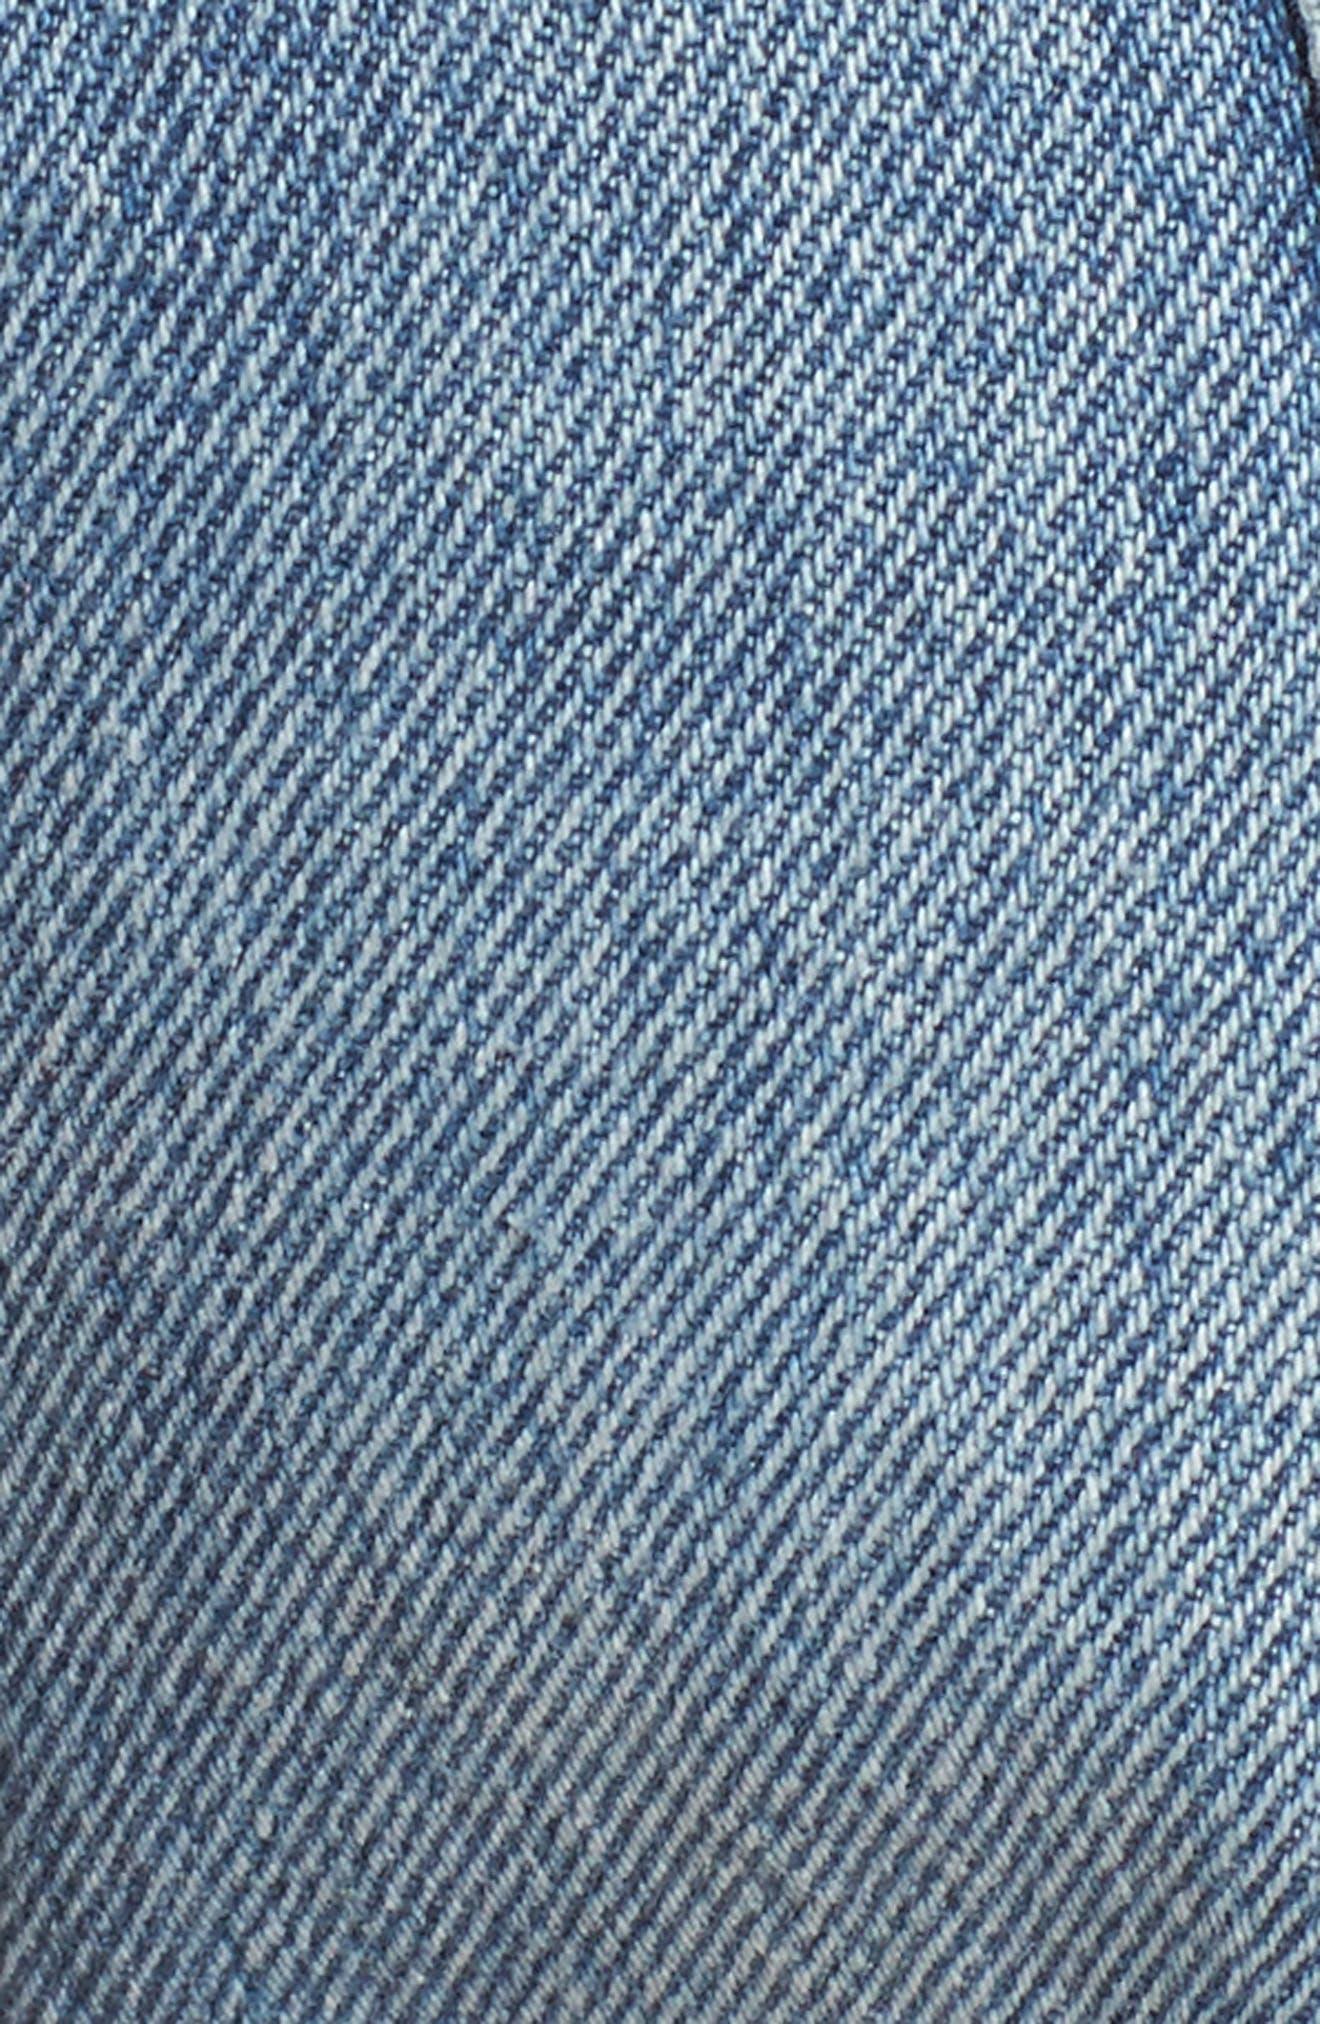 Cutoff Denim Shorts,                             Alternate thumbnail 5, color,